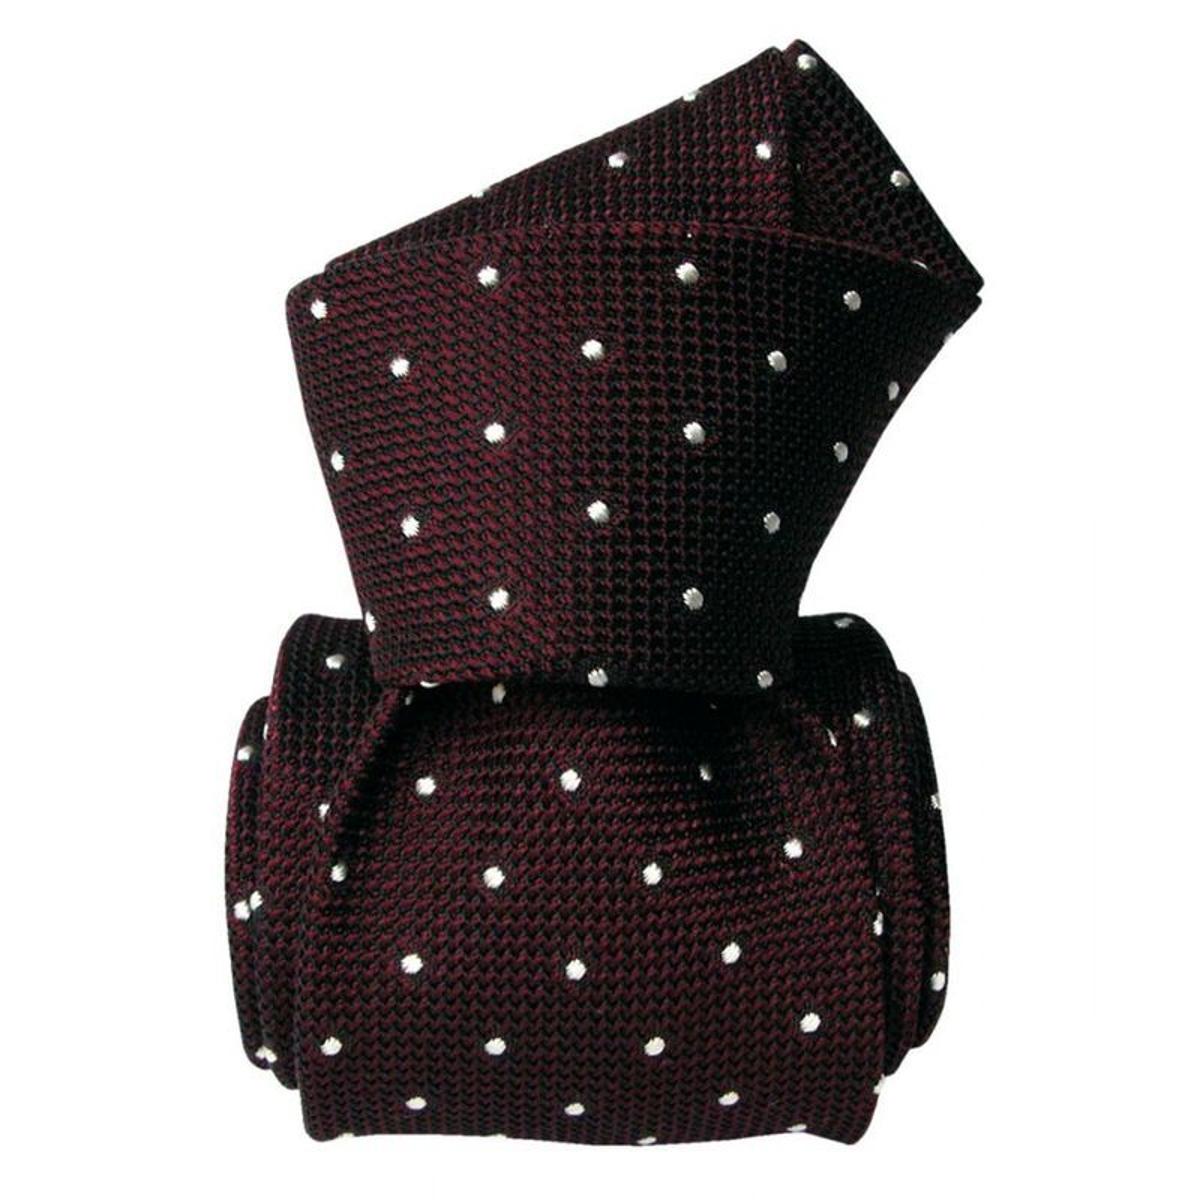 Cravate grenadine de soie luxe 1. Soie Pois